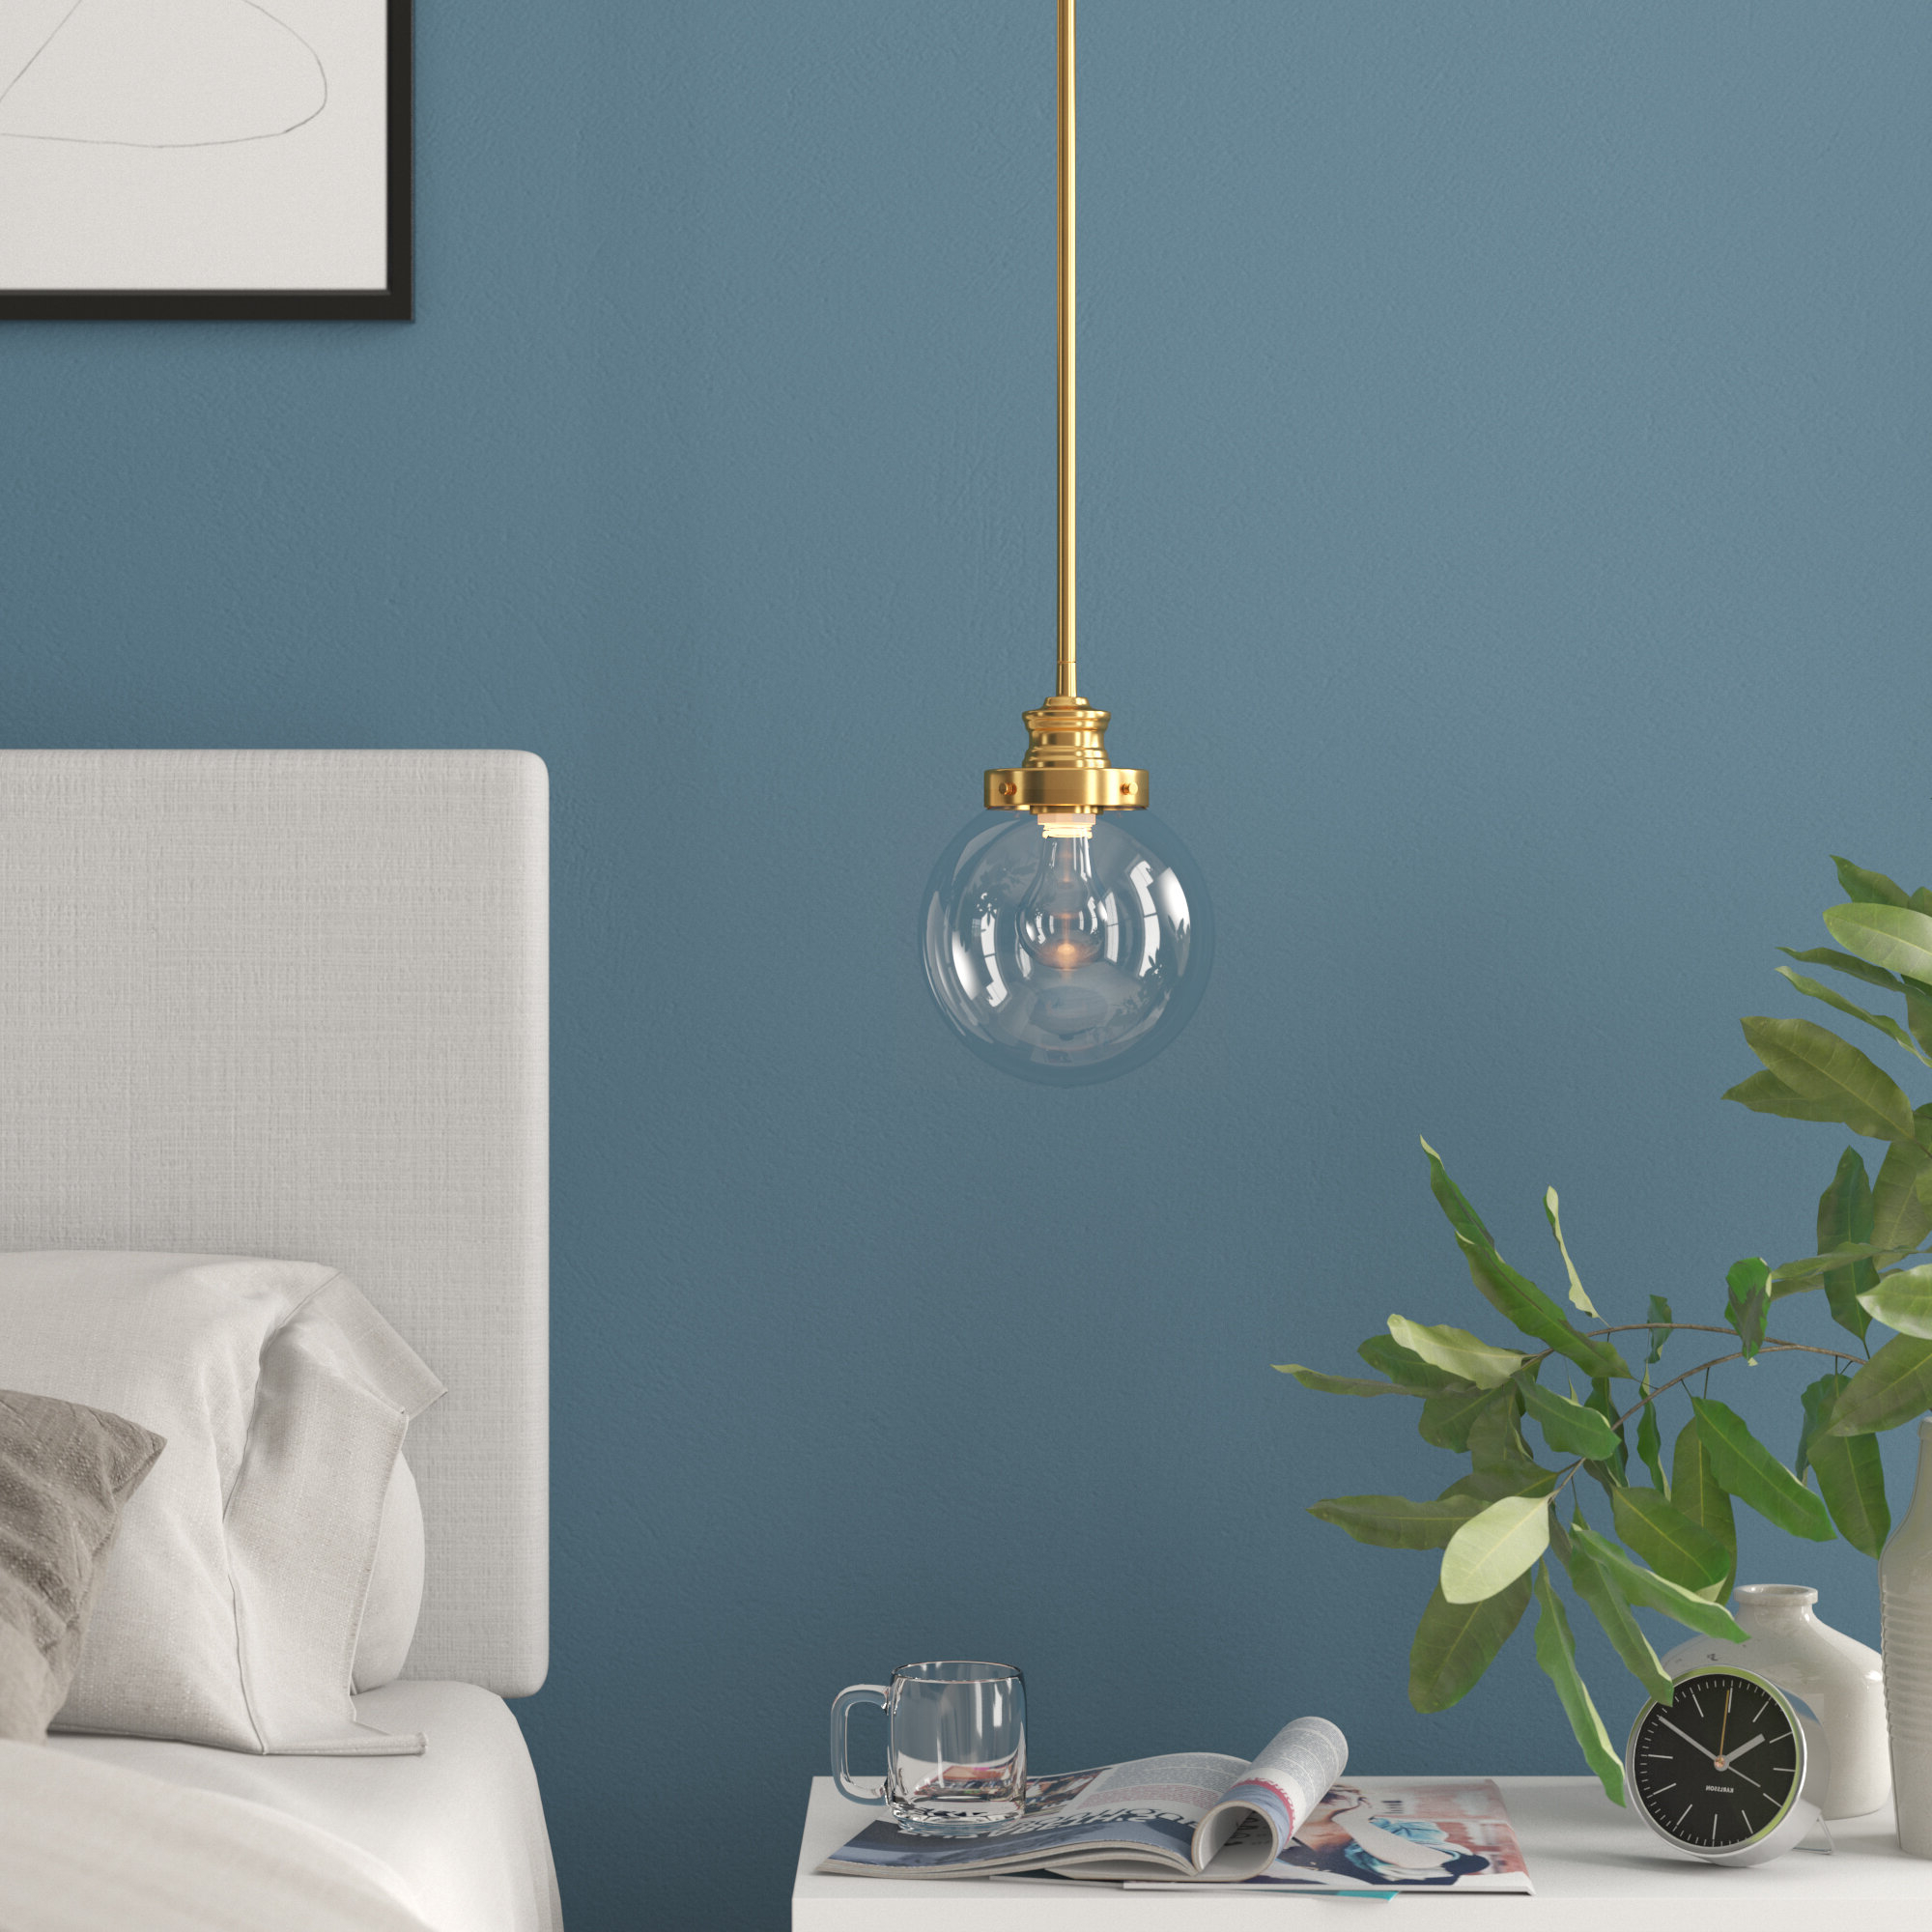 Cayden 1 Light Single Globe Pendants For Most Popular Cayden 1 Light Single Globe Pendant (View 17 of 25)